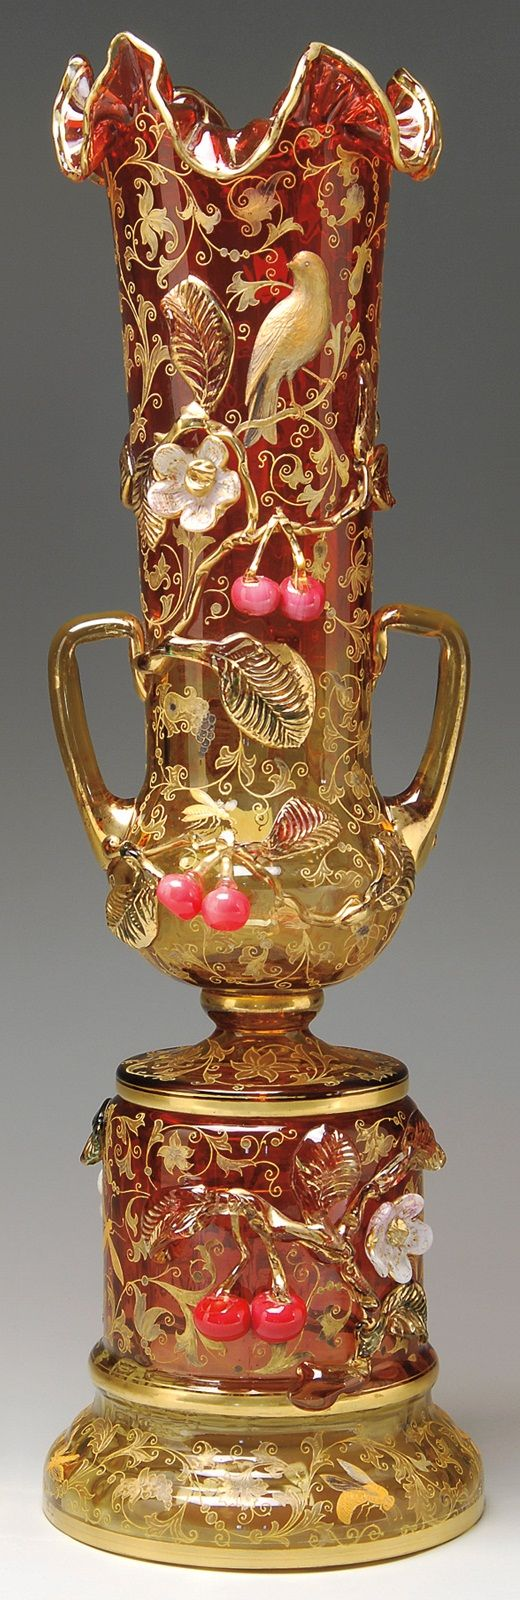 highvictoriana:    Ornate Moser bohemian glass vase, late 19th century.